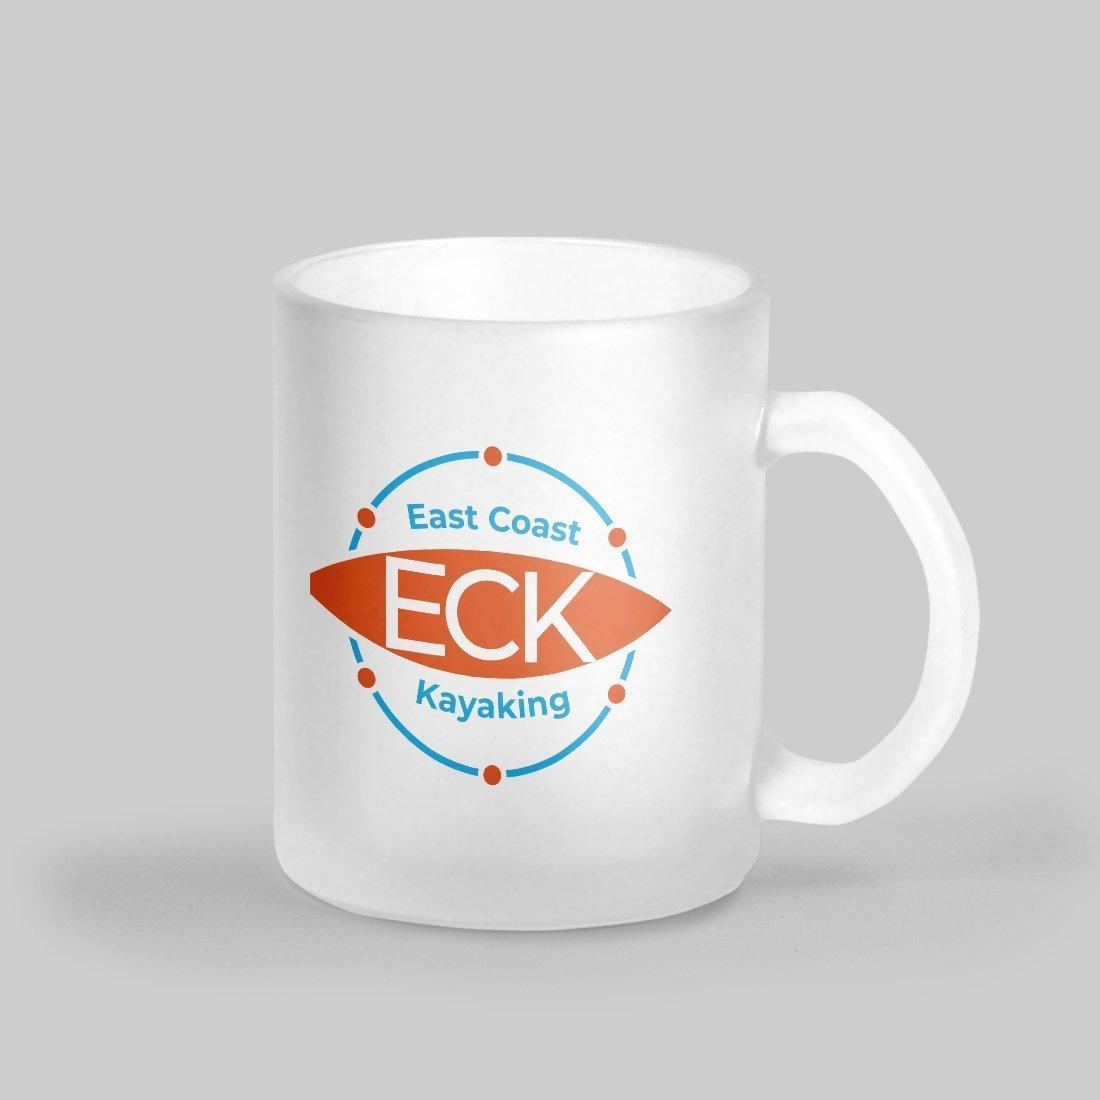 10oz Frosted Mug Corporate Gift Idea